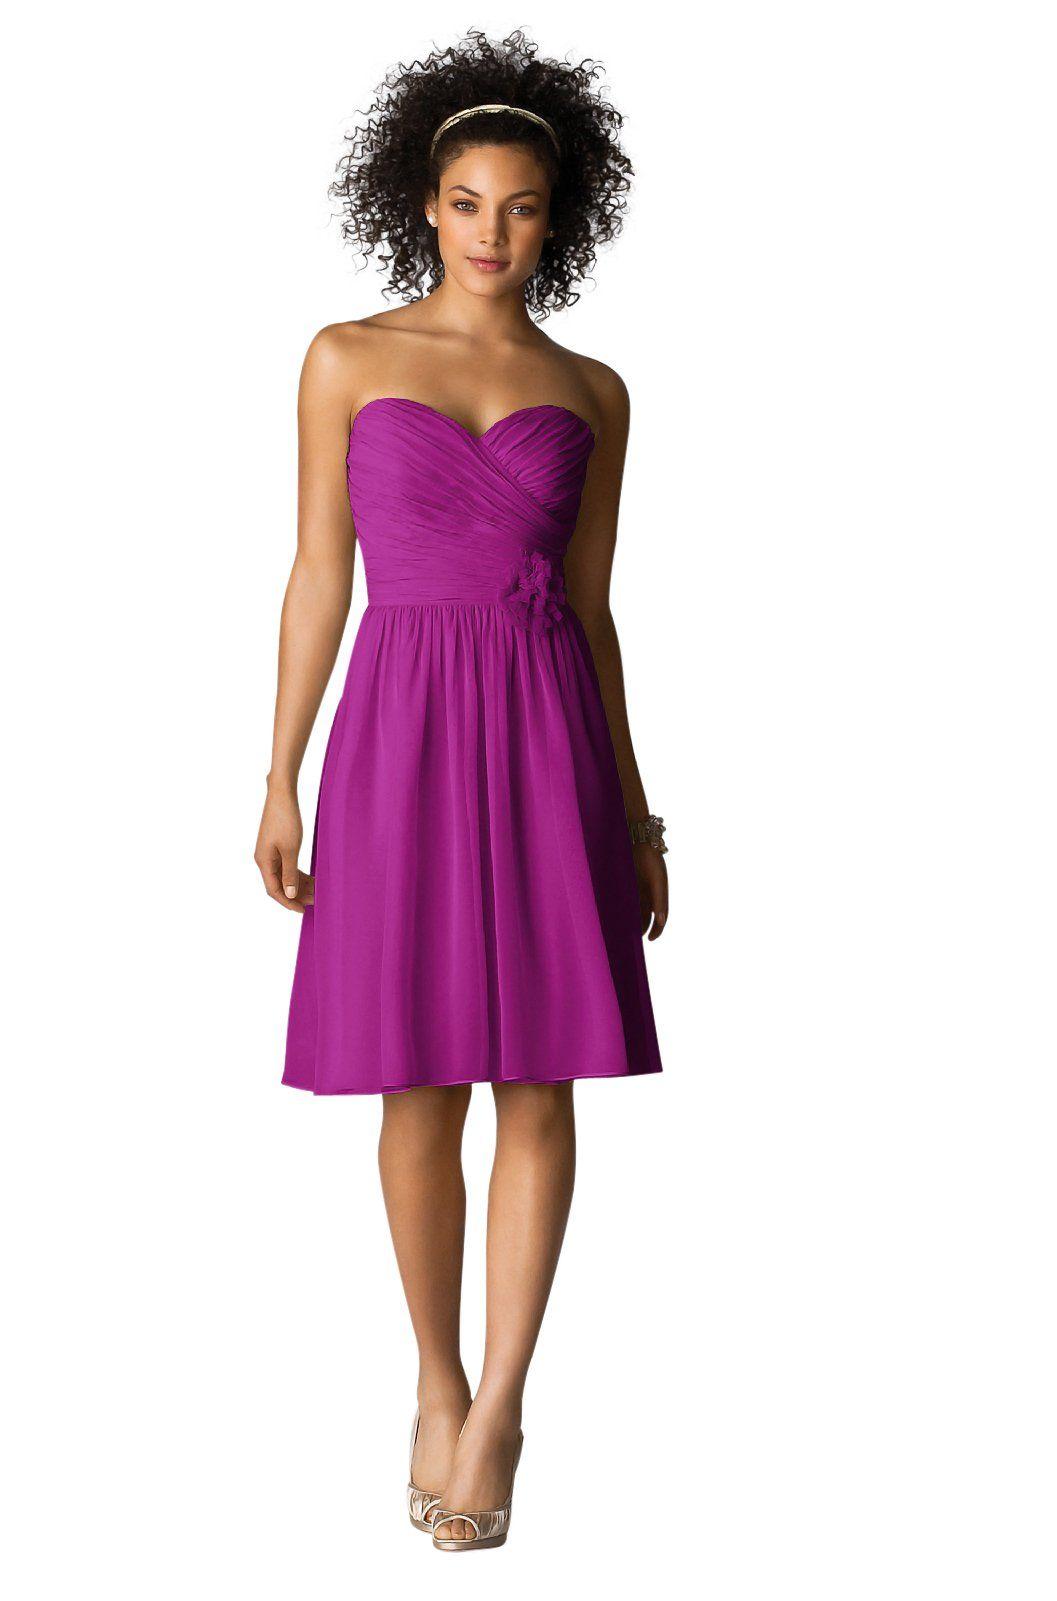 color After Six 6609 Bridesmaid Dress | Weddington Way | Wedding ...